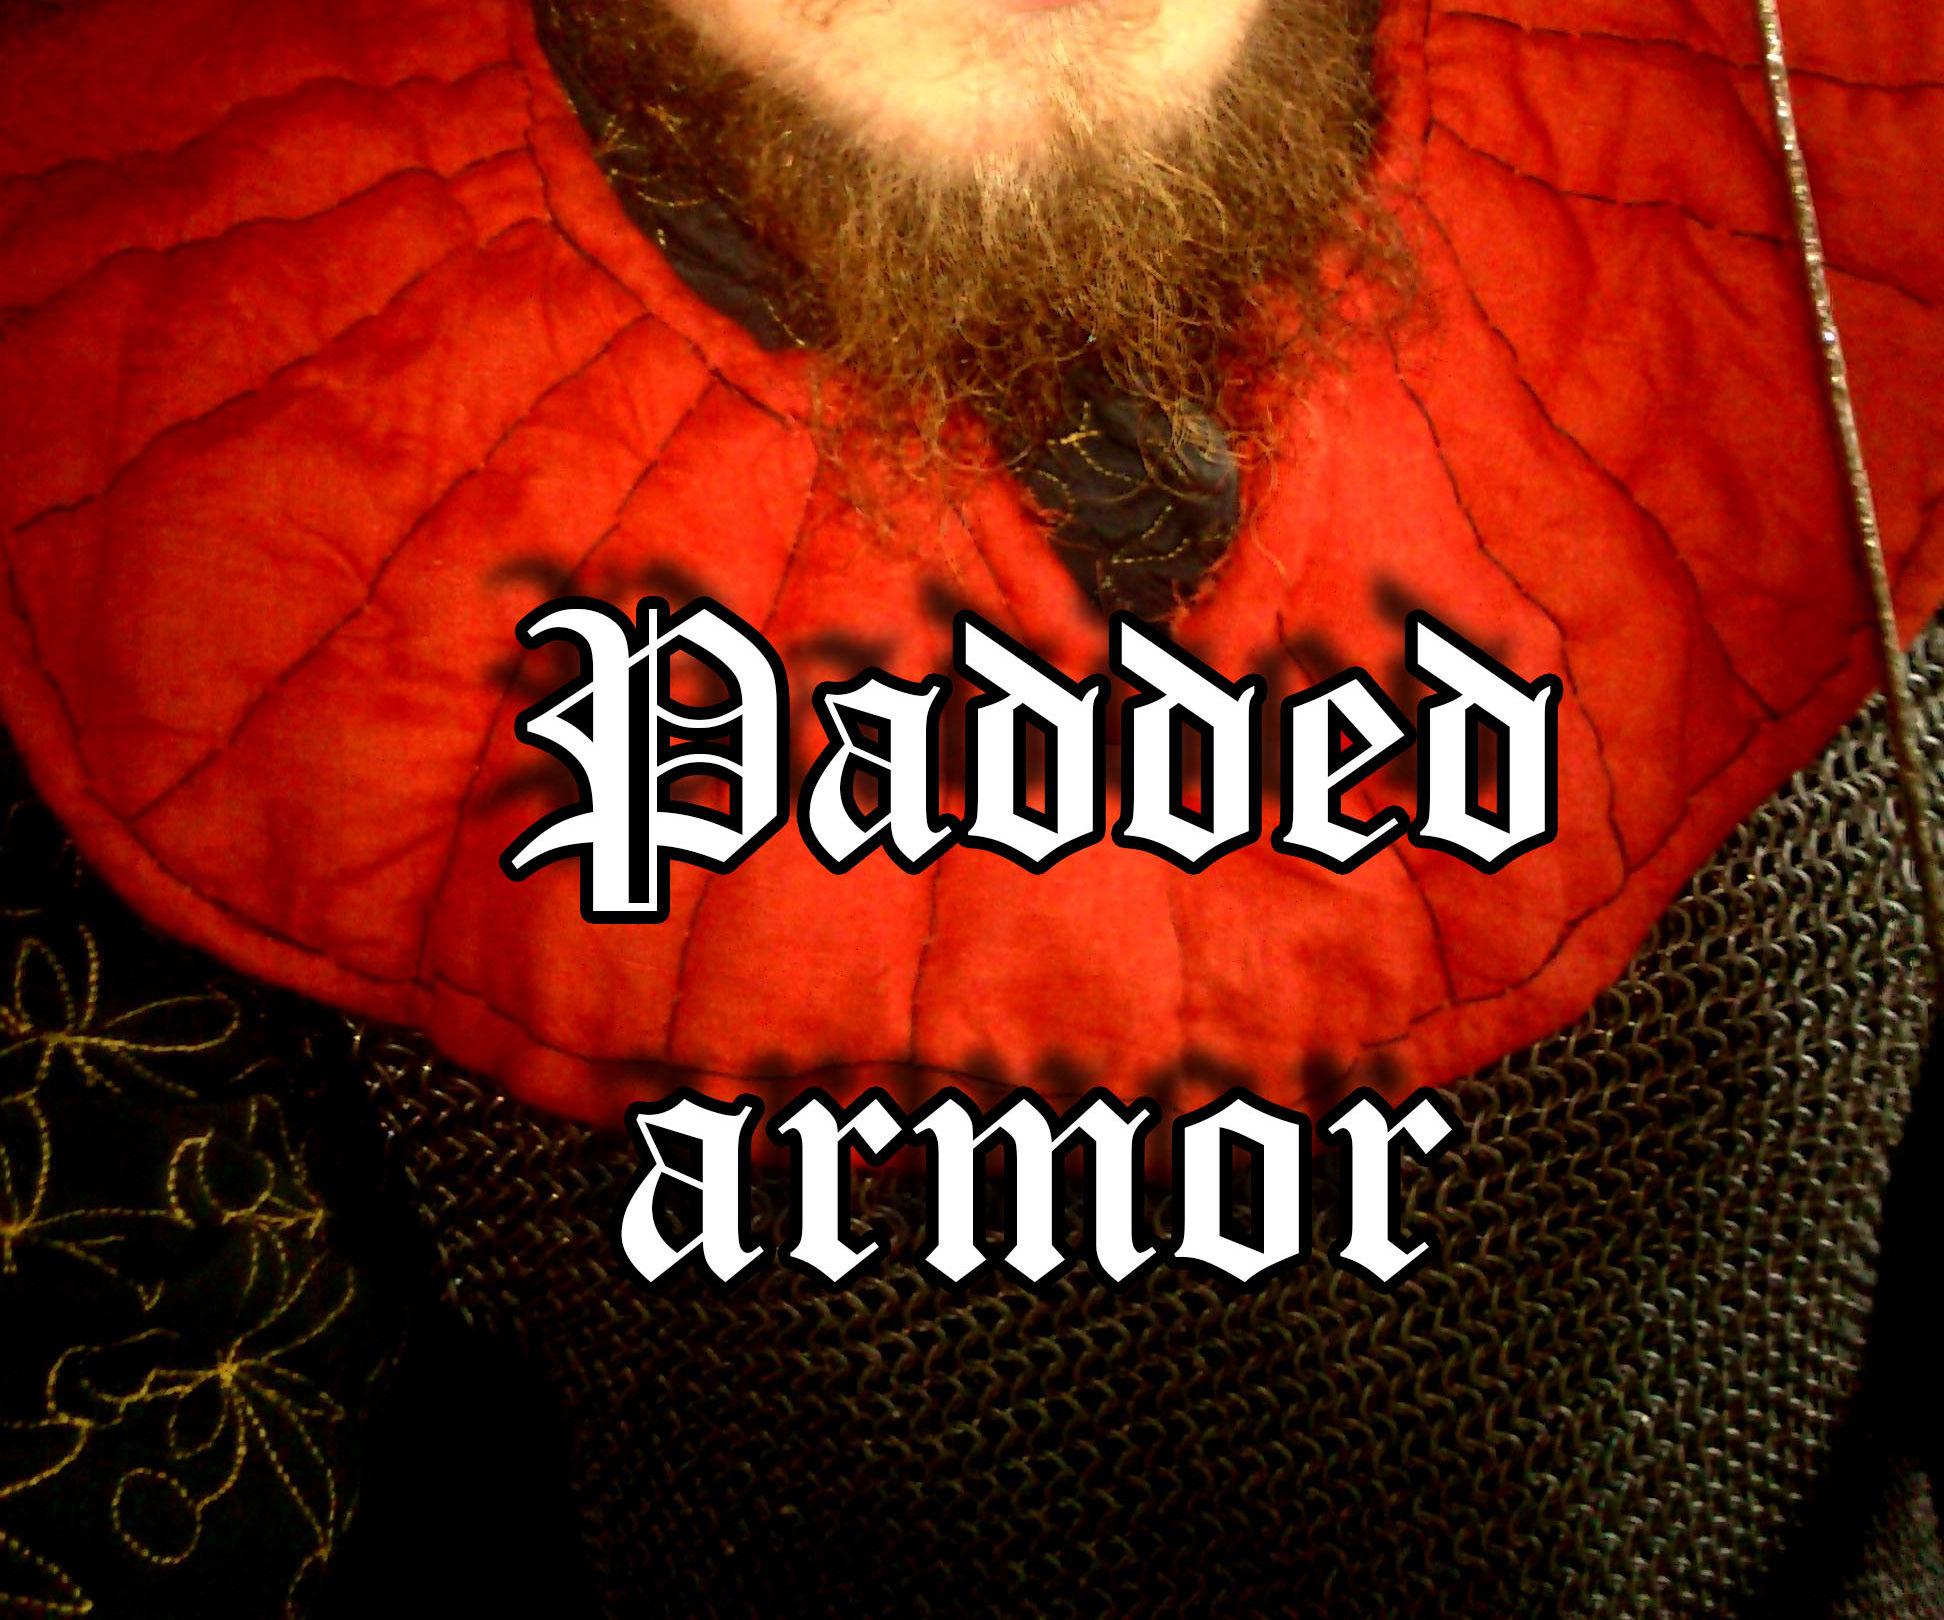 Padded collar armor